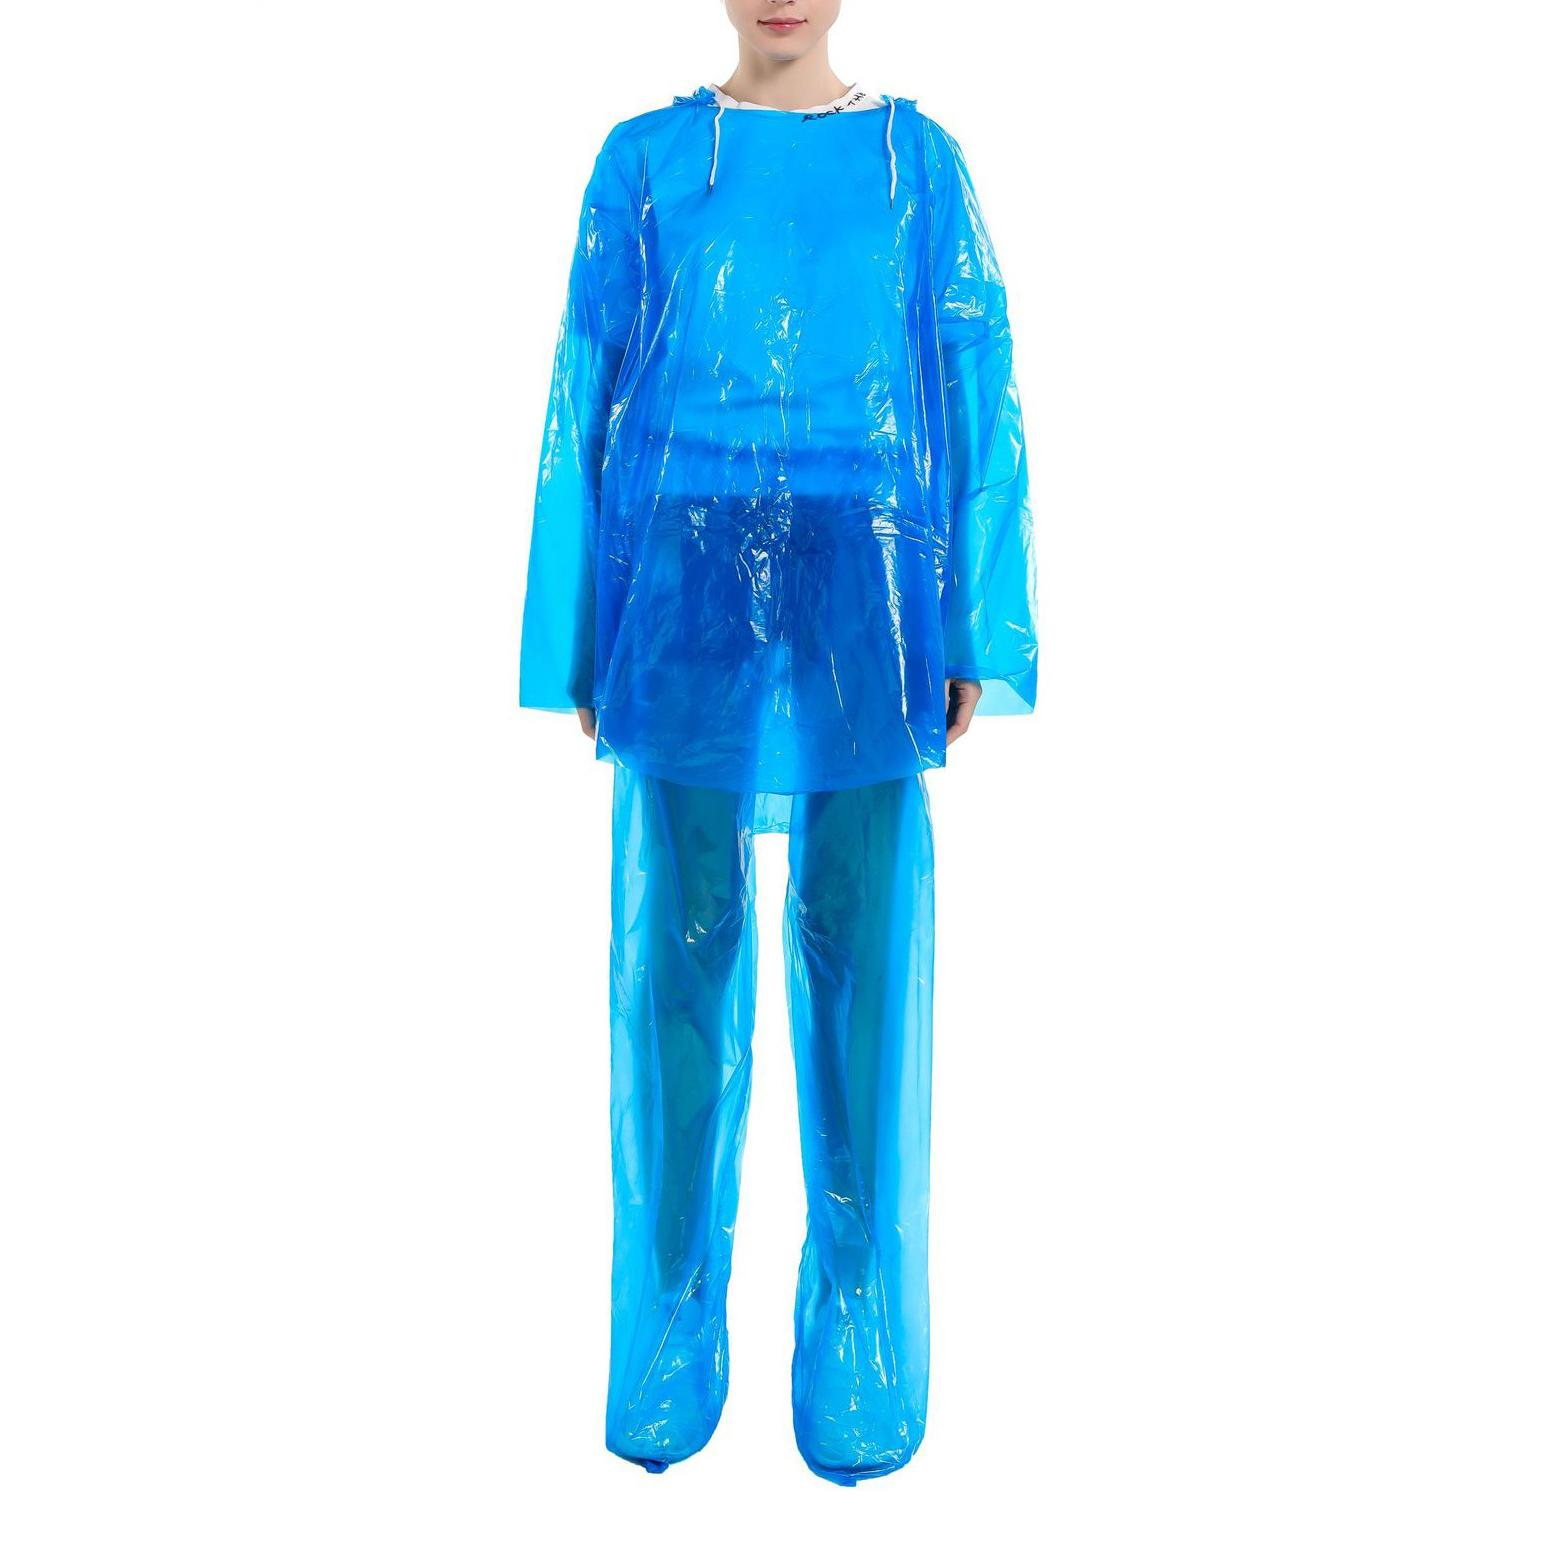 Mode Einmaliger Raincoat Hot Wegwerf-PET Einweg-Regenmäntel Poncho Regen Reise-Regen-Mantel Regen-Bekleidung Füße Zweiteilige Großhandel FY6044